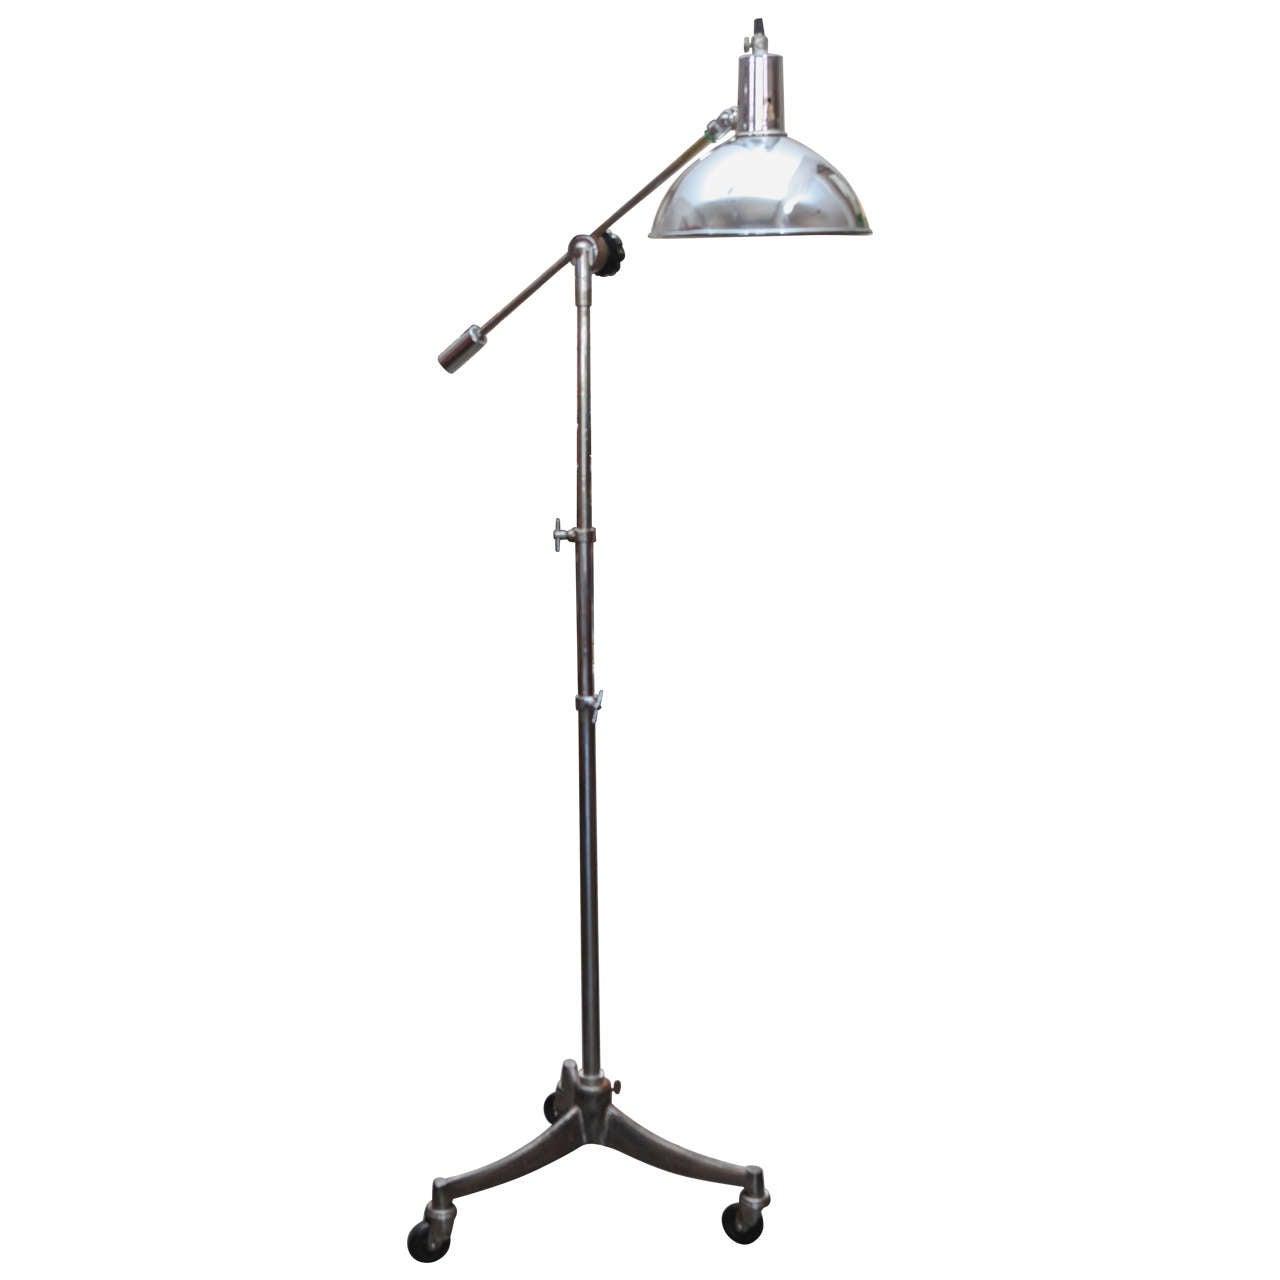 Mid-Century Adjustable Metal Lamp on Tripod Wheeled Base from England